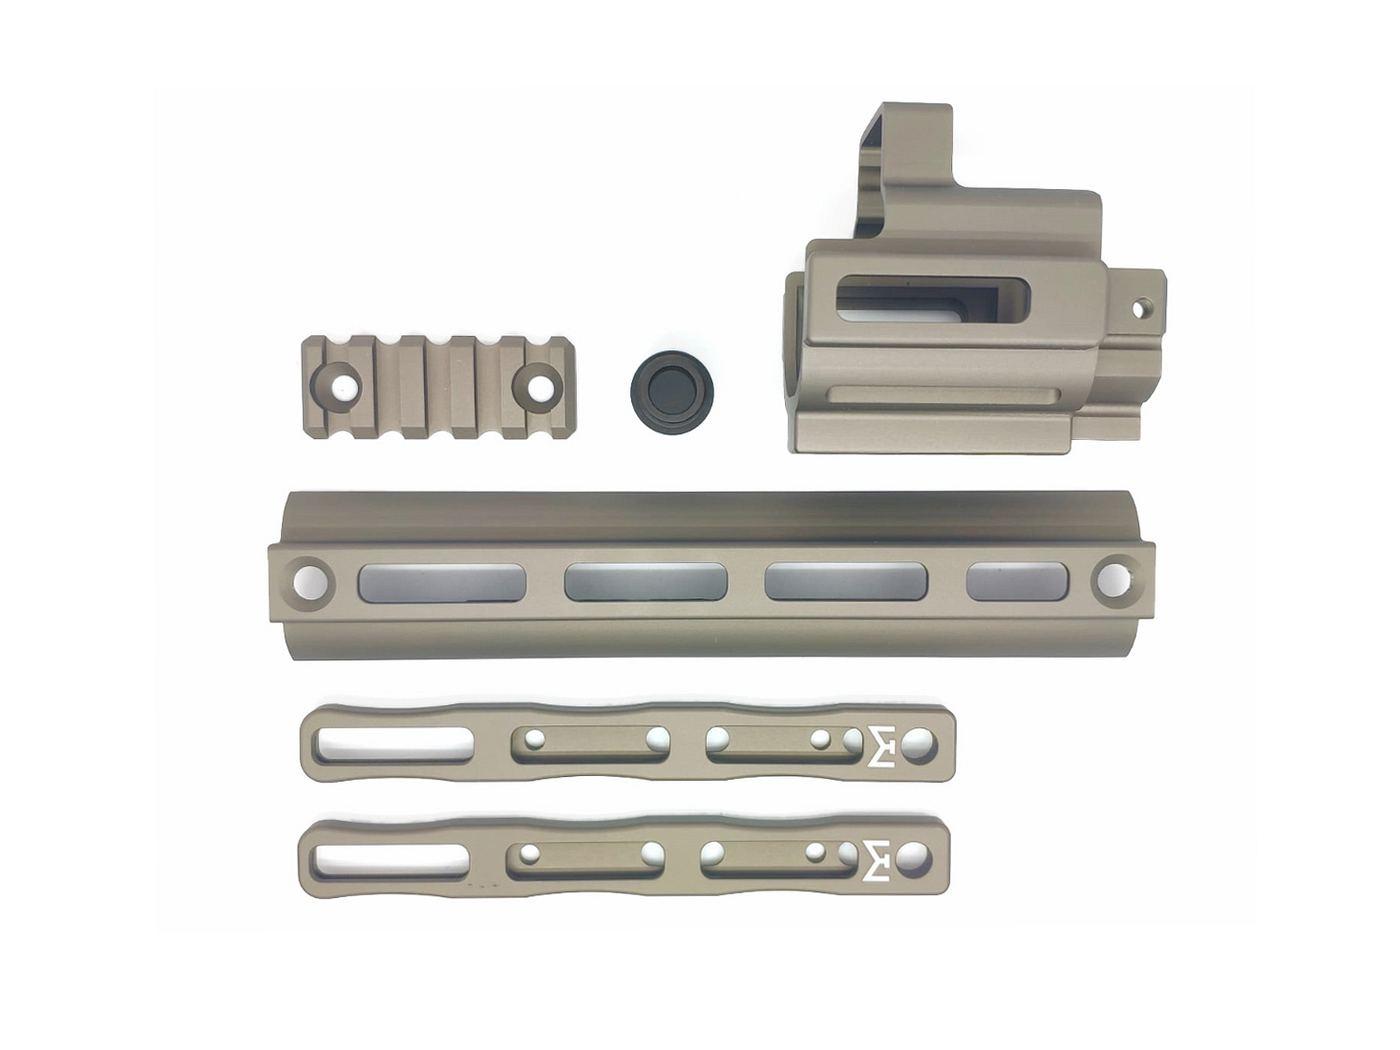 CloneTech PMM型 SCAR M-LOKレイルアダプター/エクステンションキット (マルイ